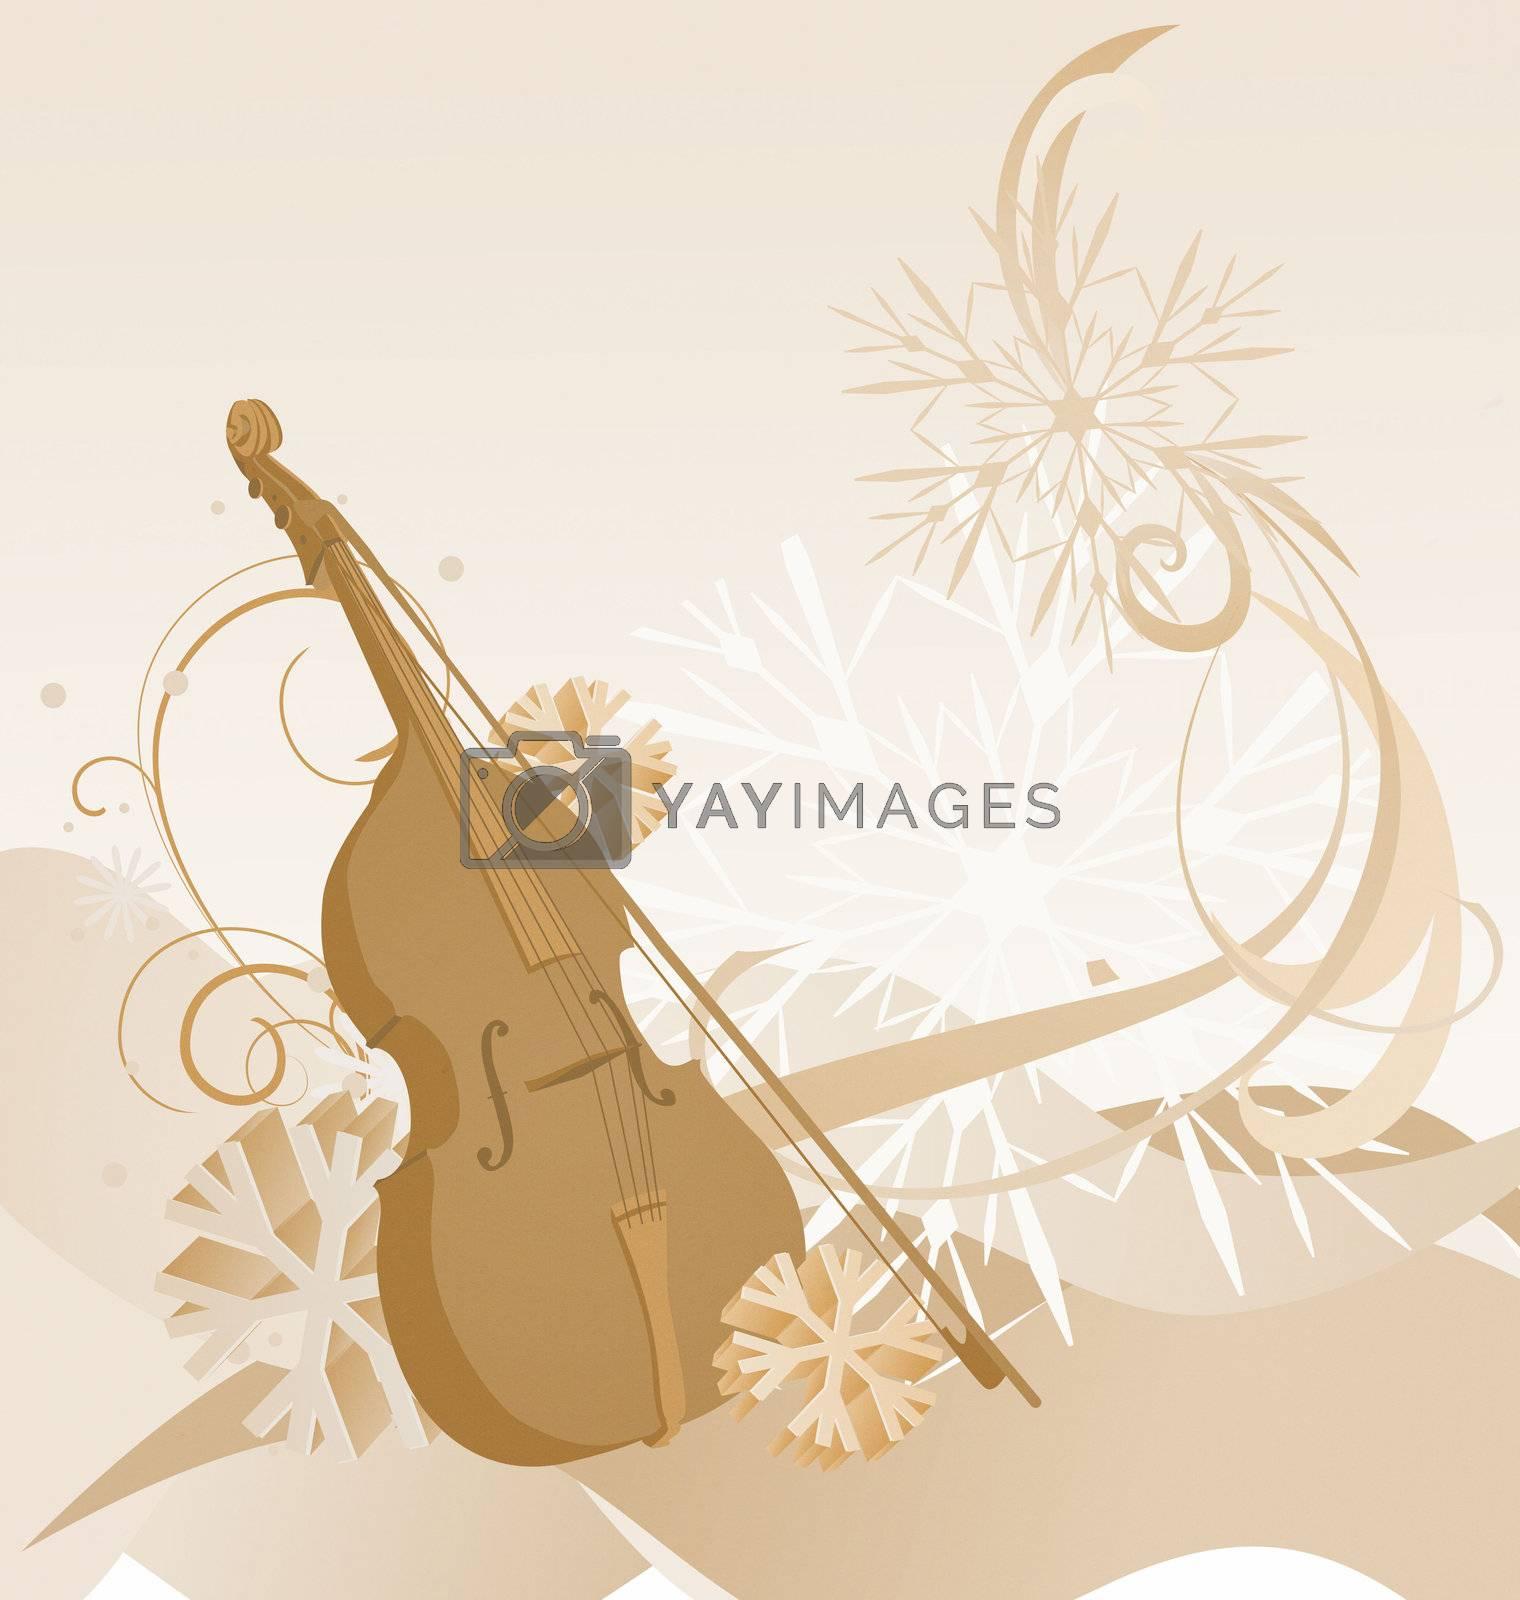 brown retro violin winter illustration